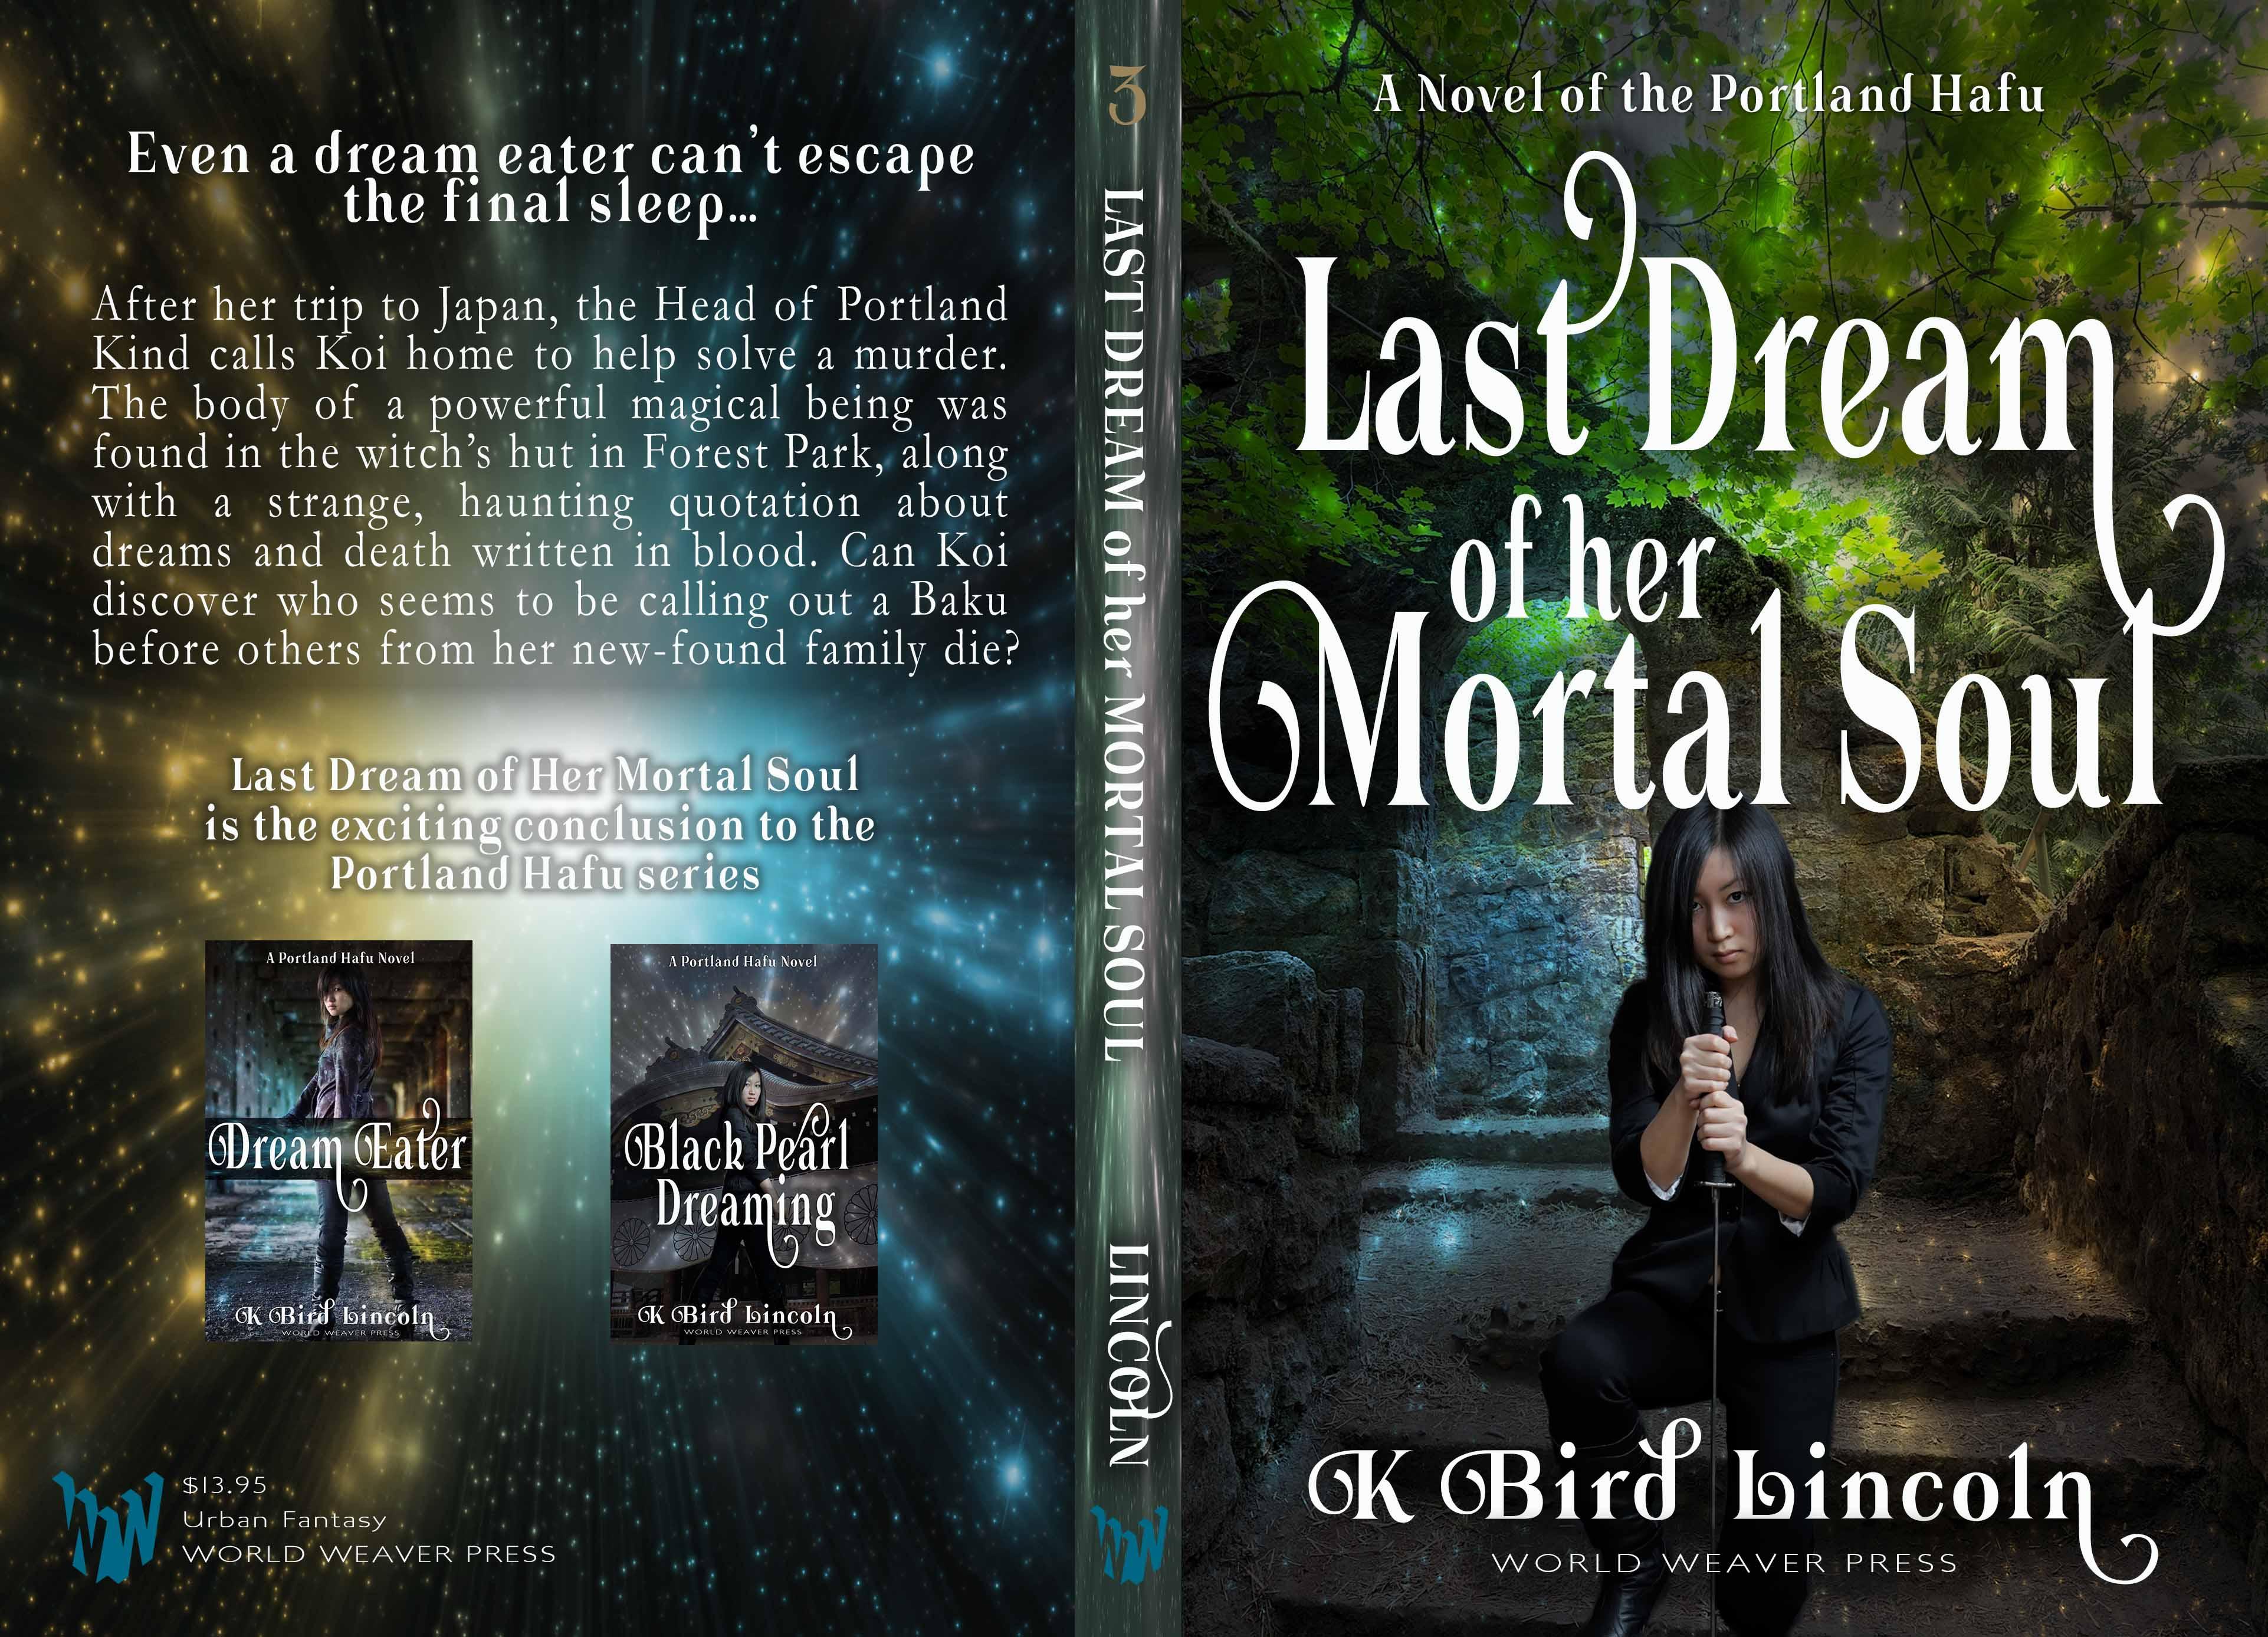 Last Dream of Her Mortal Soul